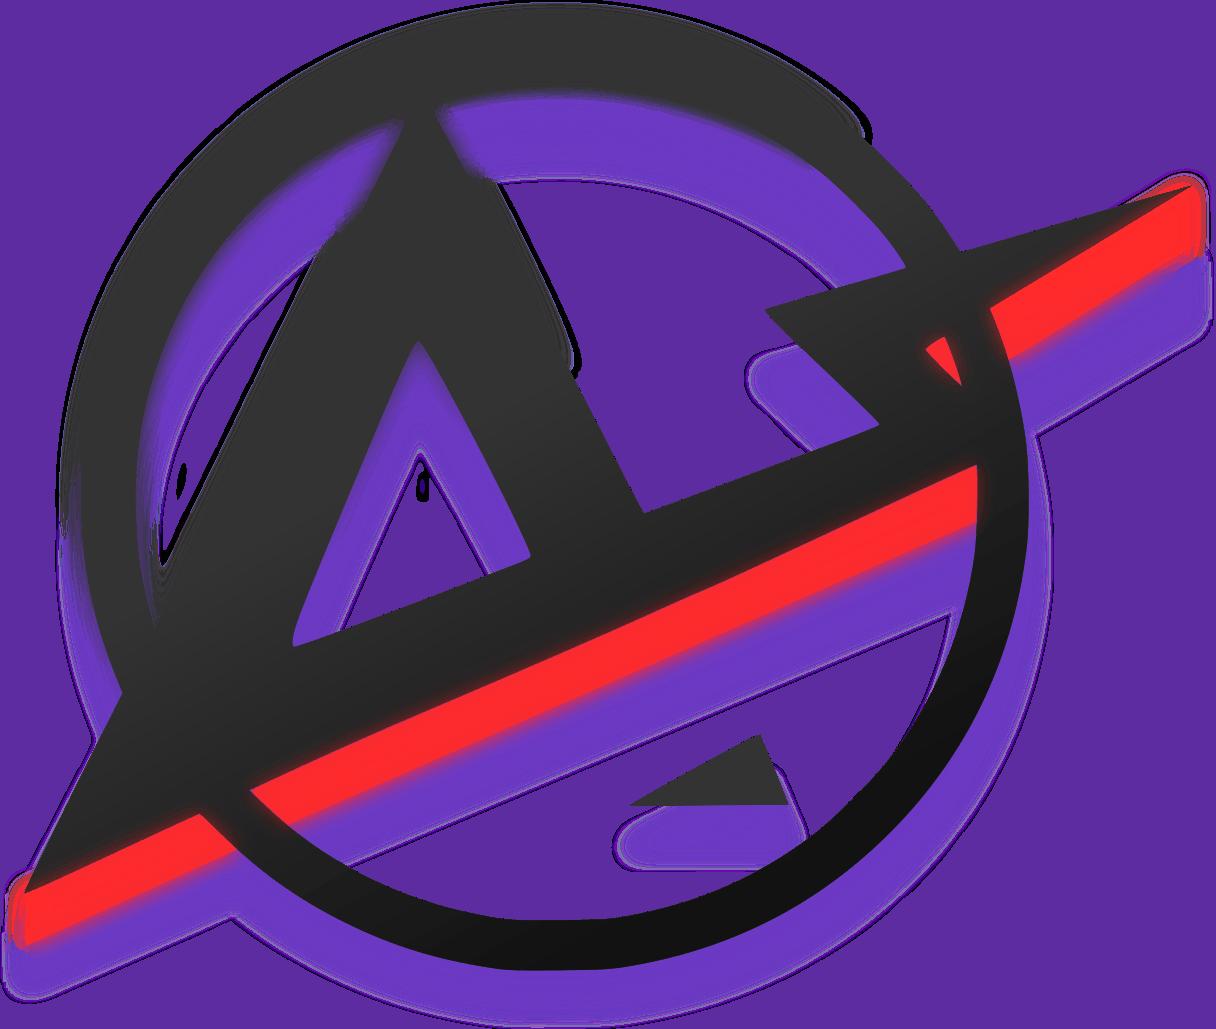 Discord logo - Amped.fm